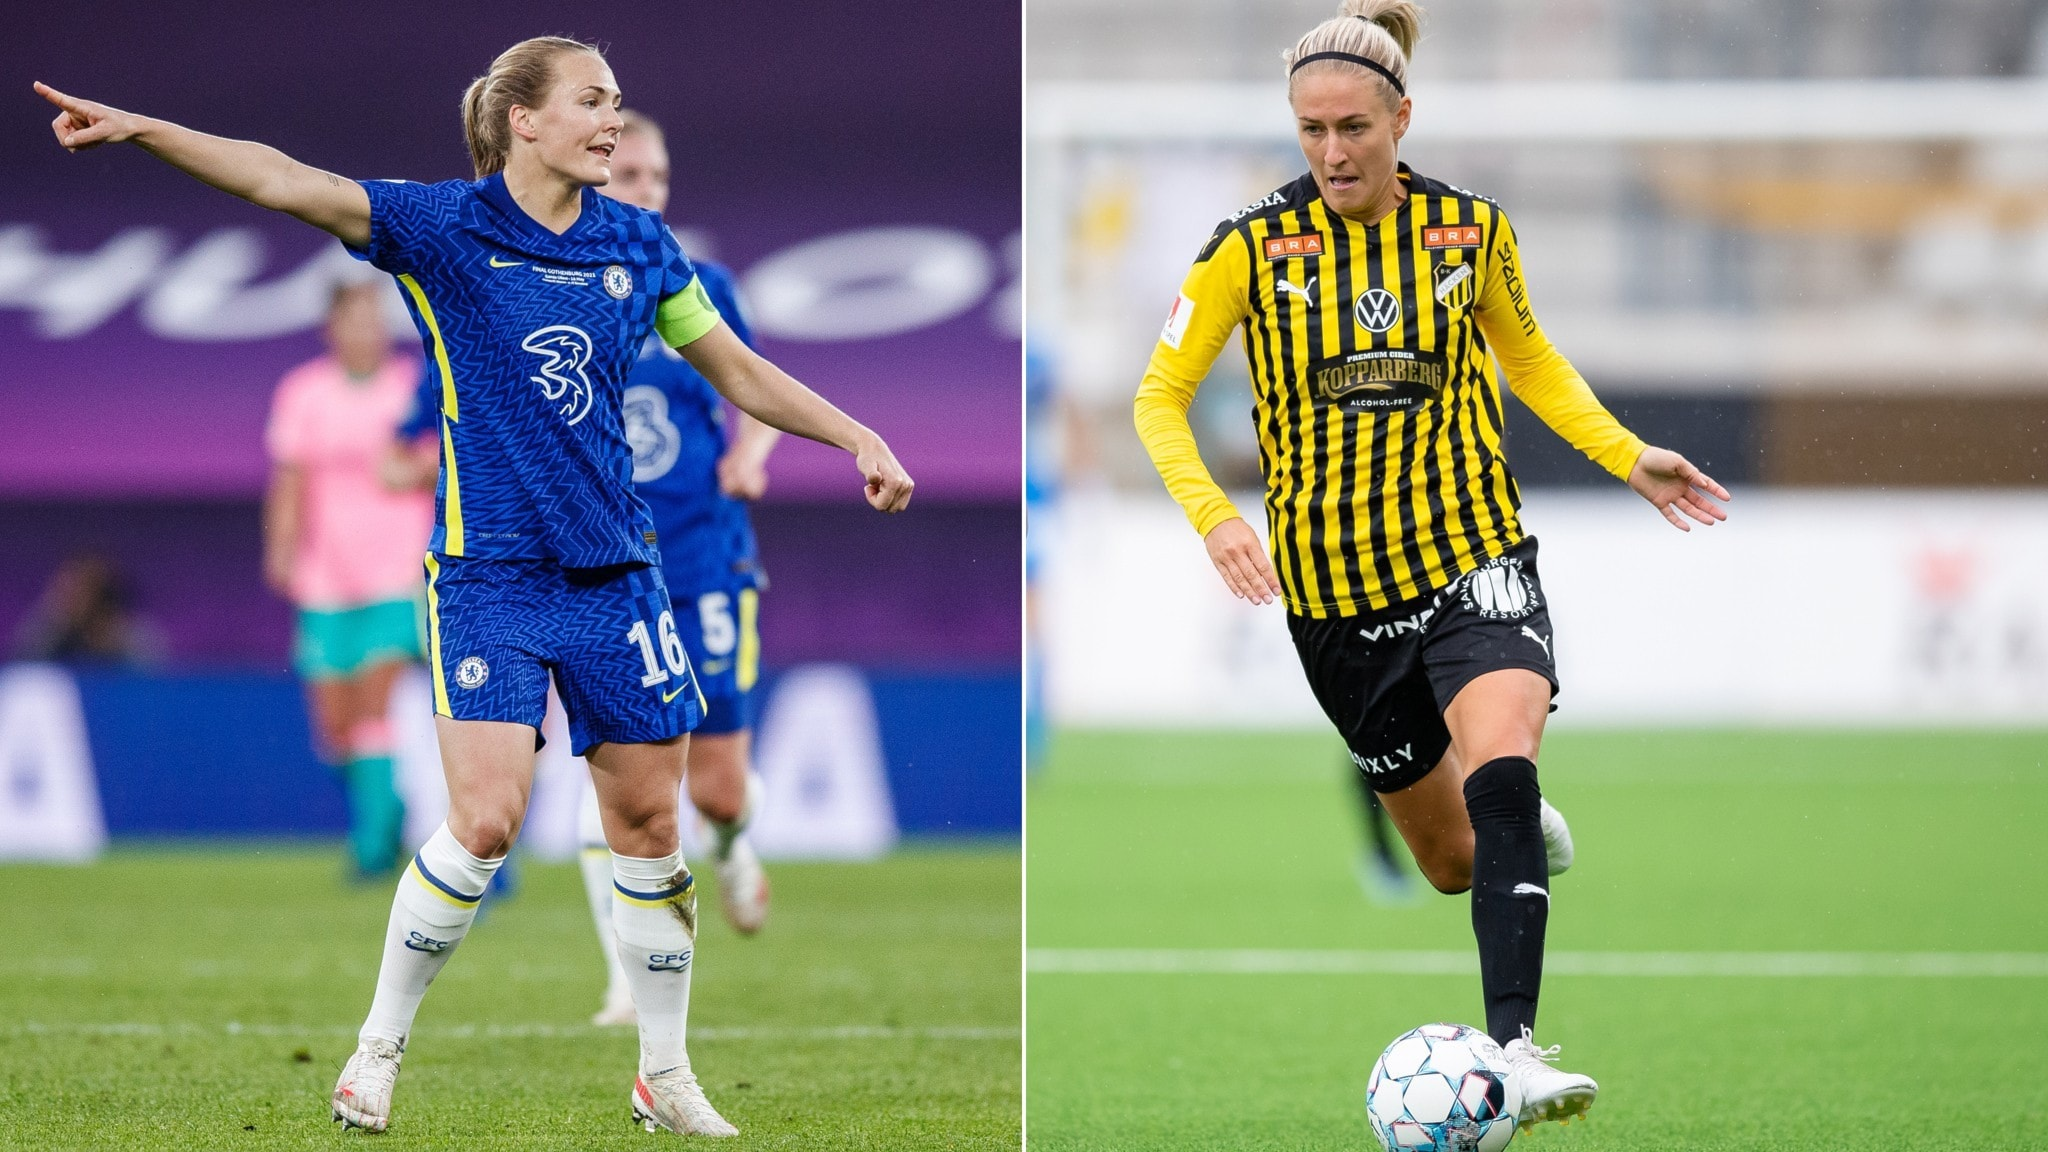 Emma Kullberg before CL draw: It would be fun to meet Chelsea – Radiosporten – Radio Sweden